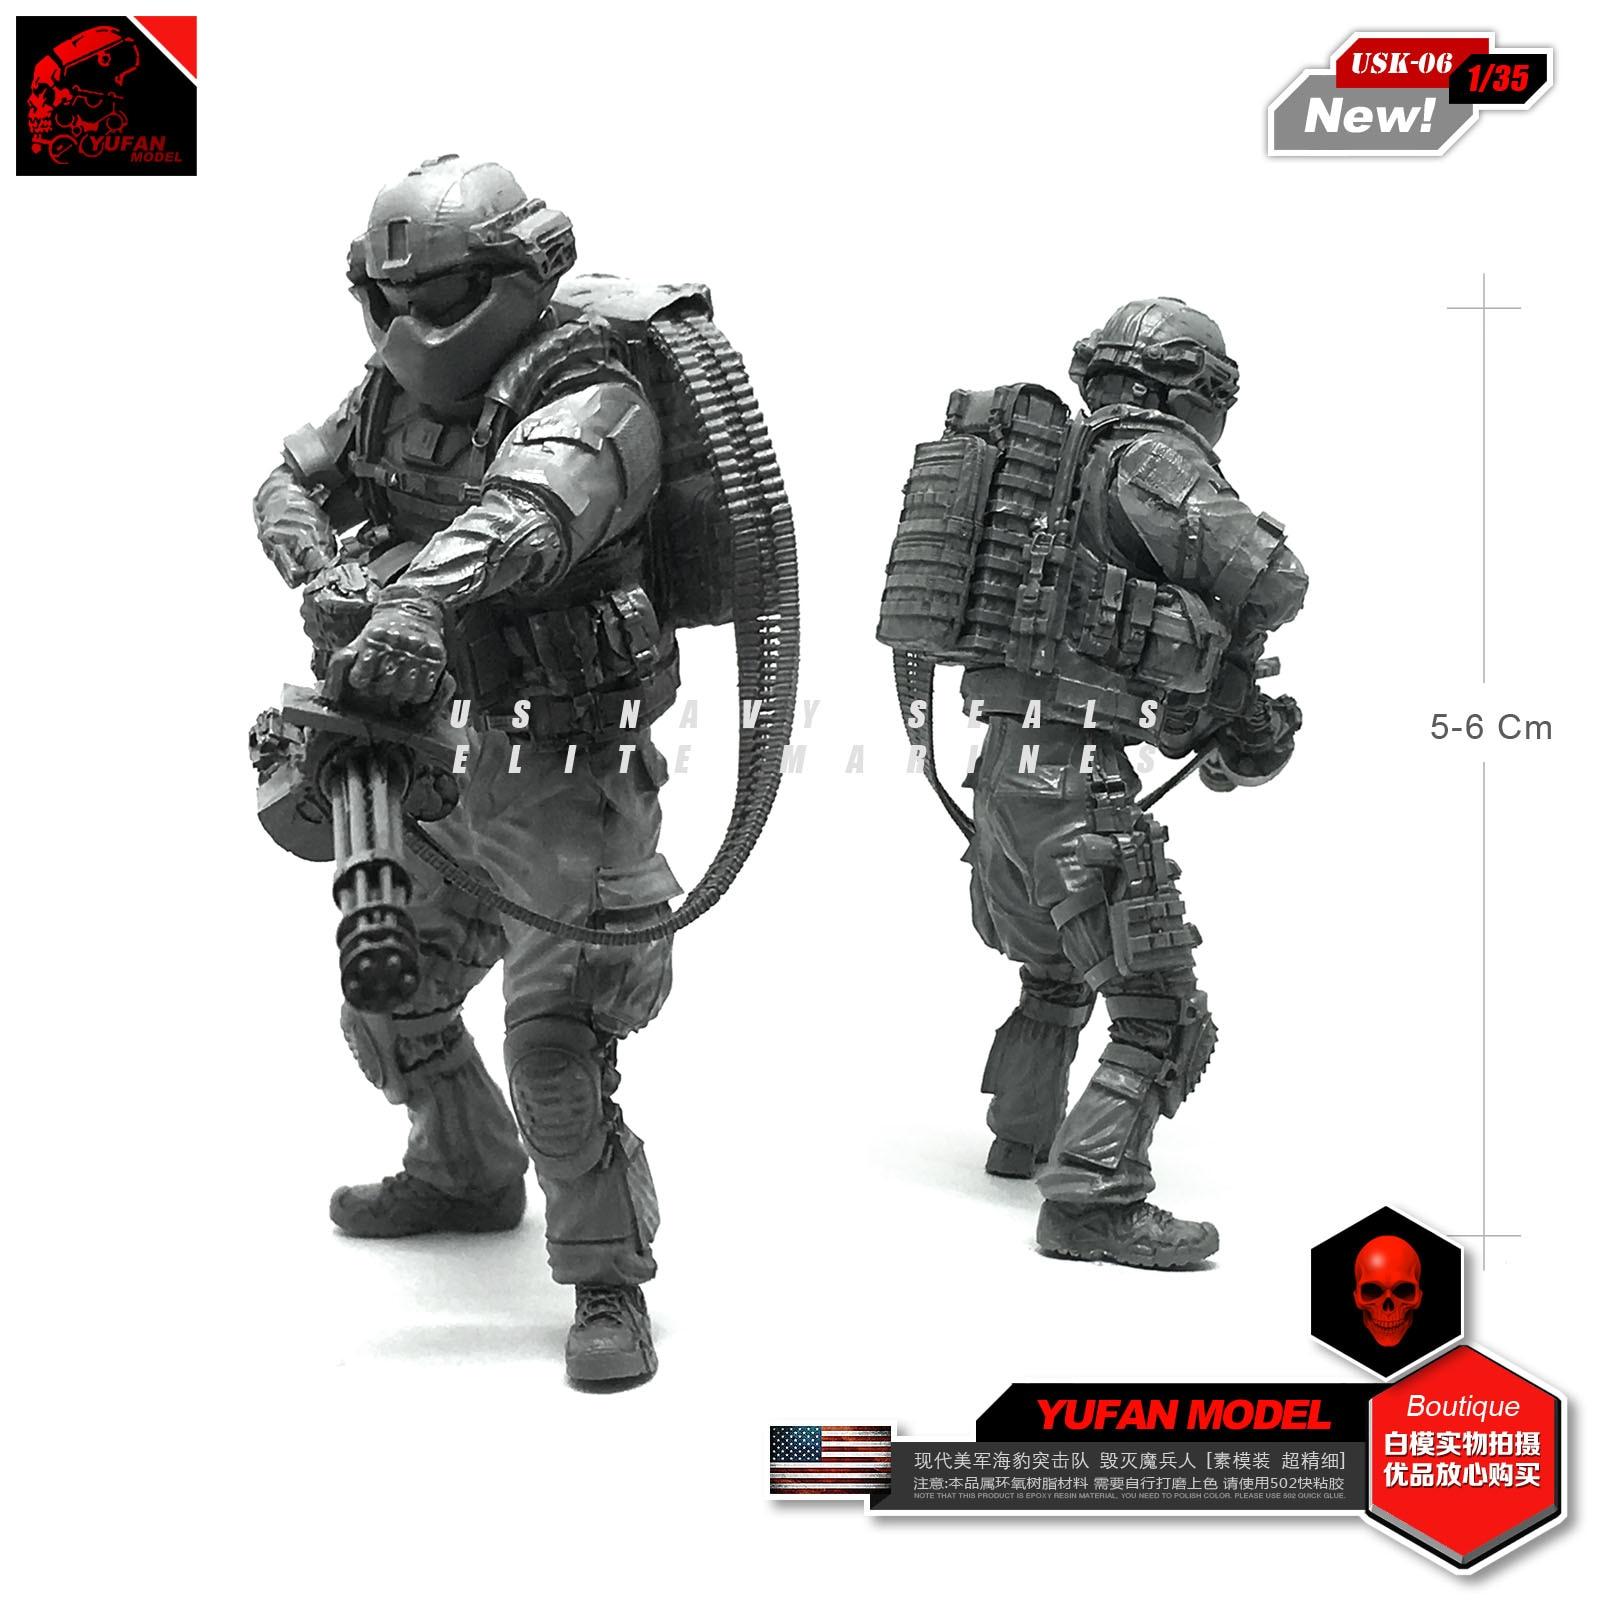 Yufan Model 1/35 Modern Us Seal Destruction Warrior Model Assembled Model  Kit Usk-06